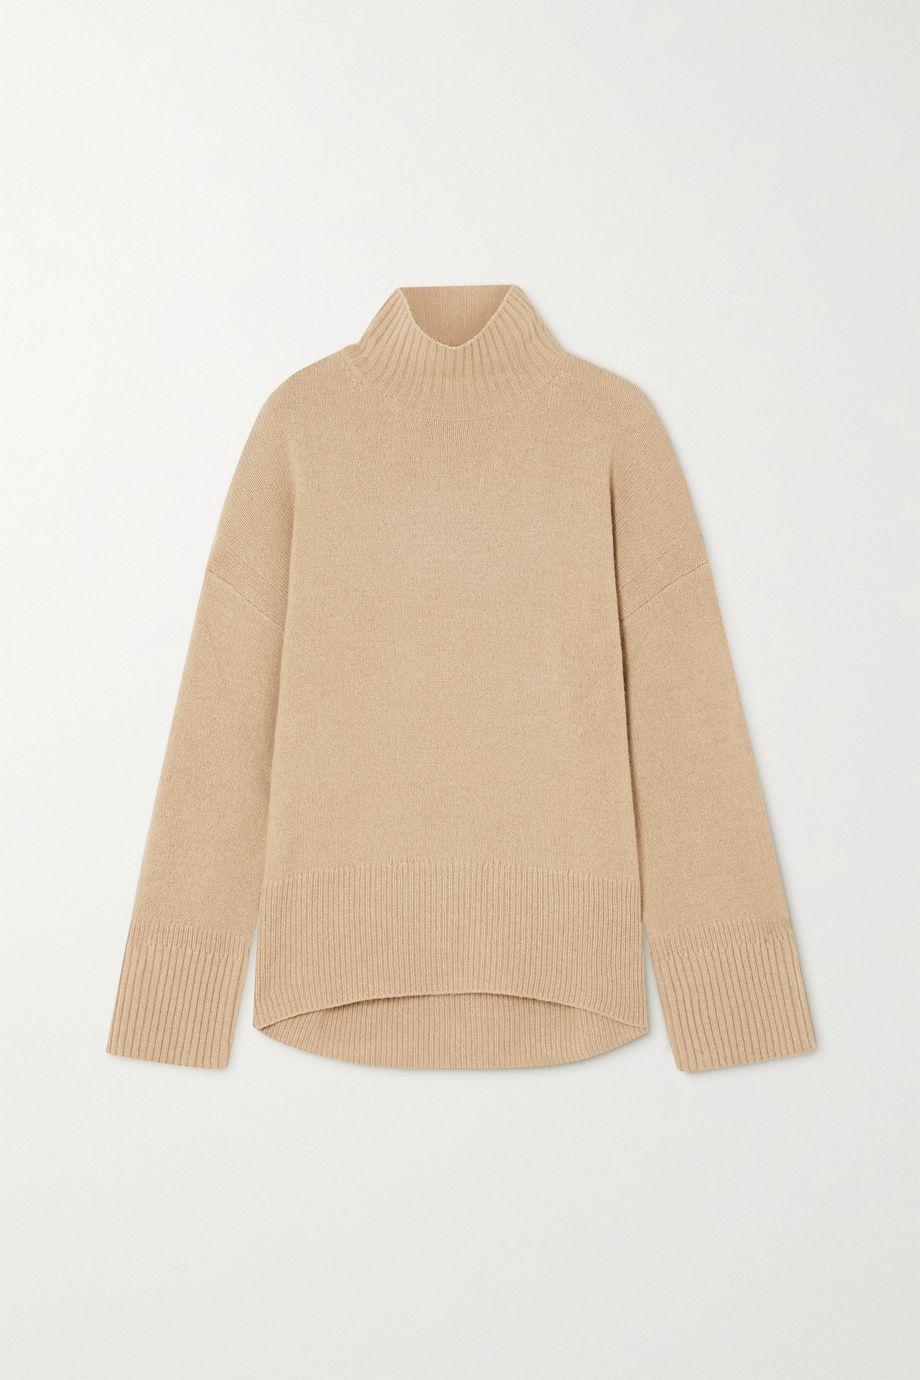 FRAME Turtleneck cashmere sweater